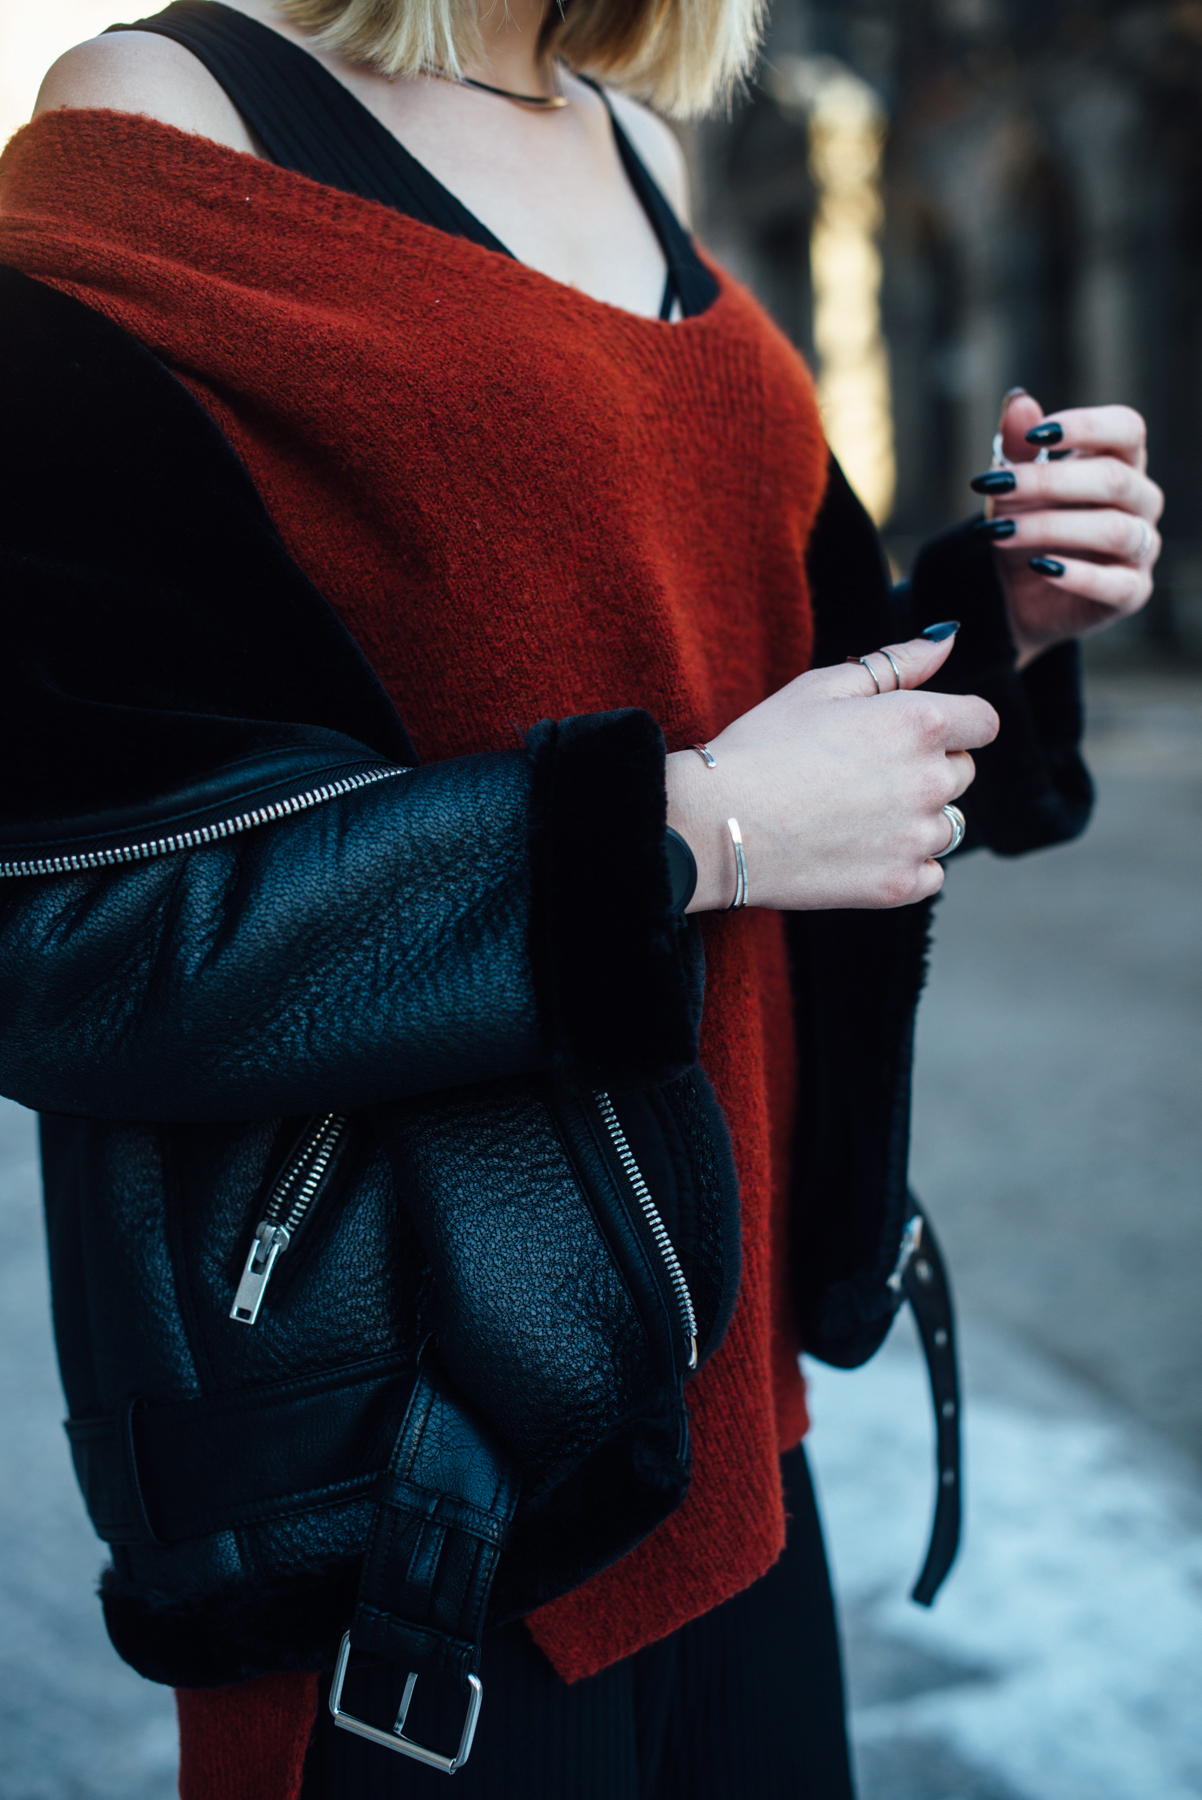 04-Kiamisu-Modeblog-Fashion Week Berlin_Shearling Jacke_Tamaris Stiefeletten_Schiebermütze-23